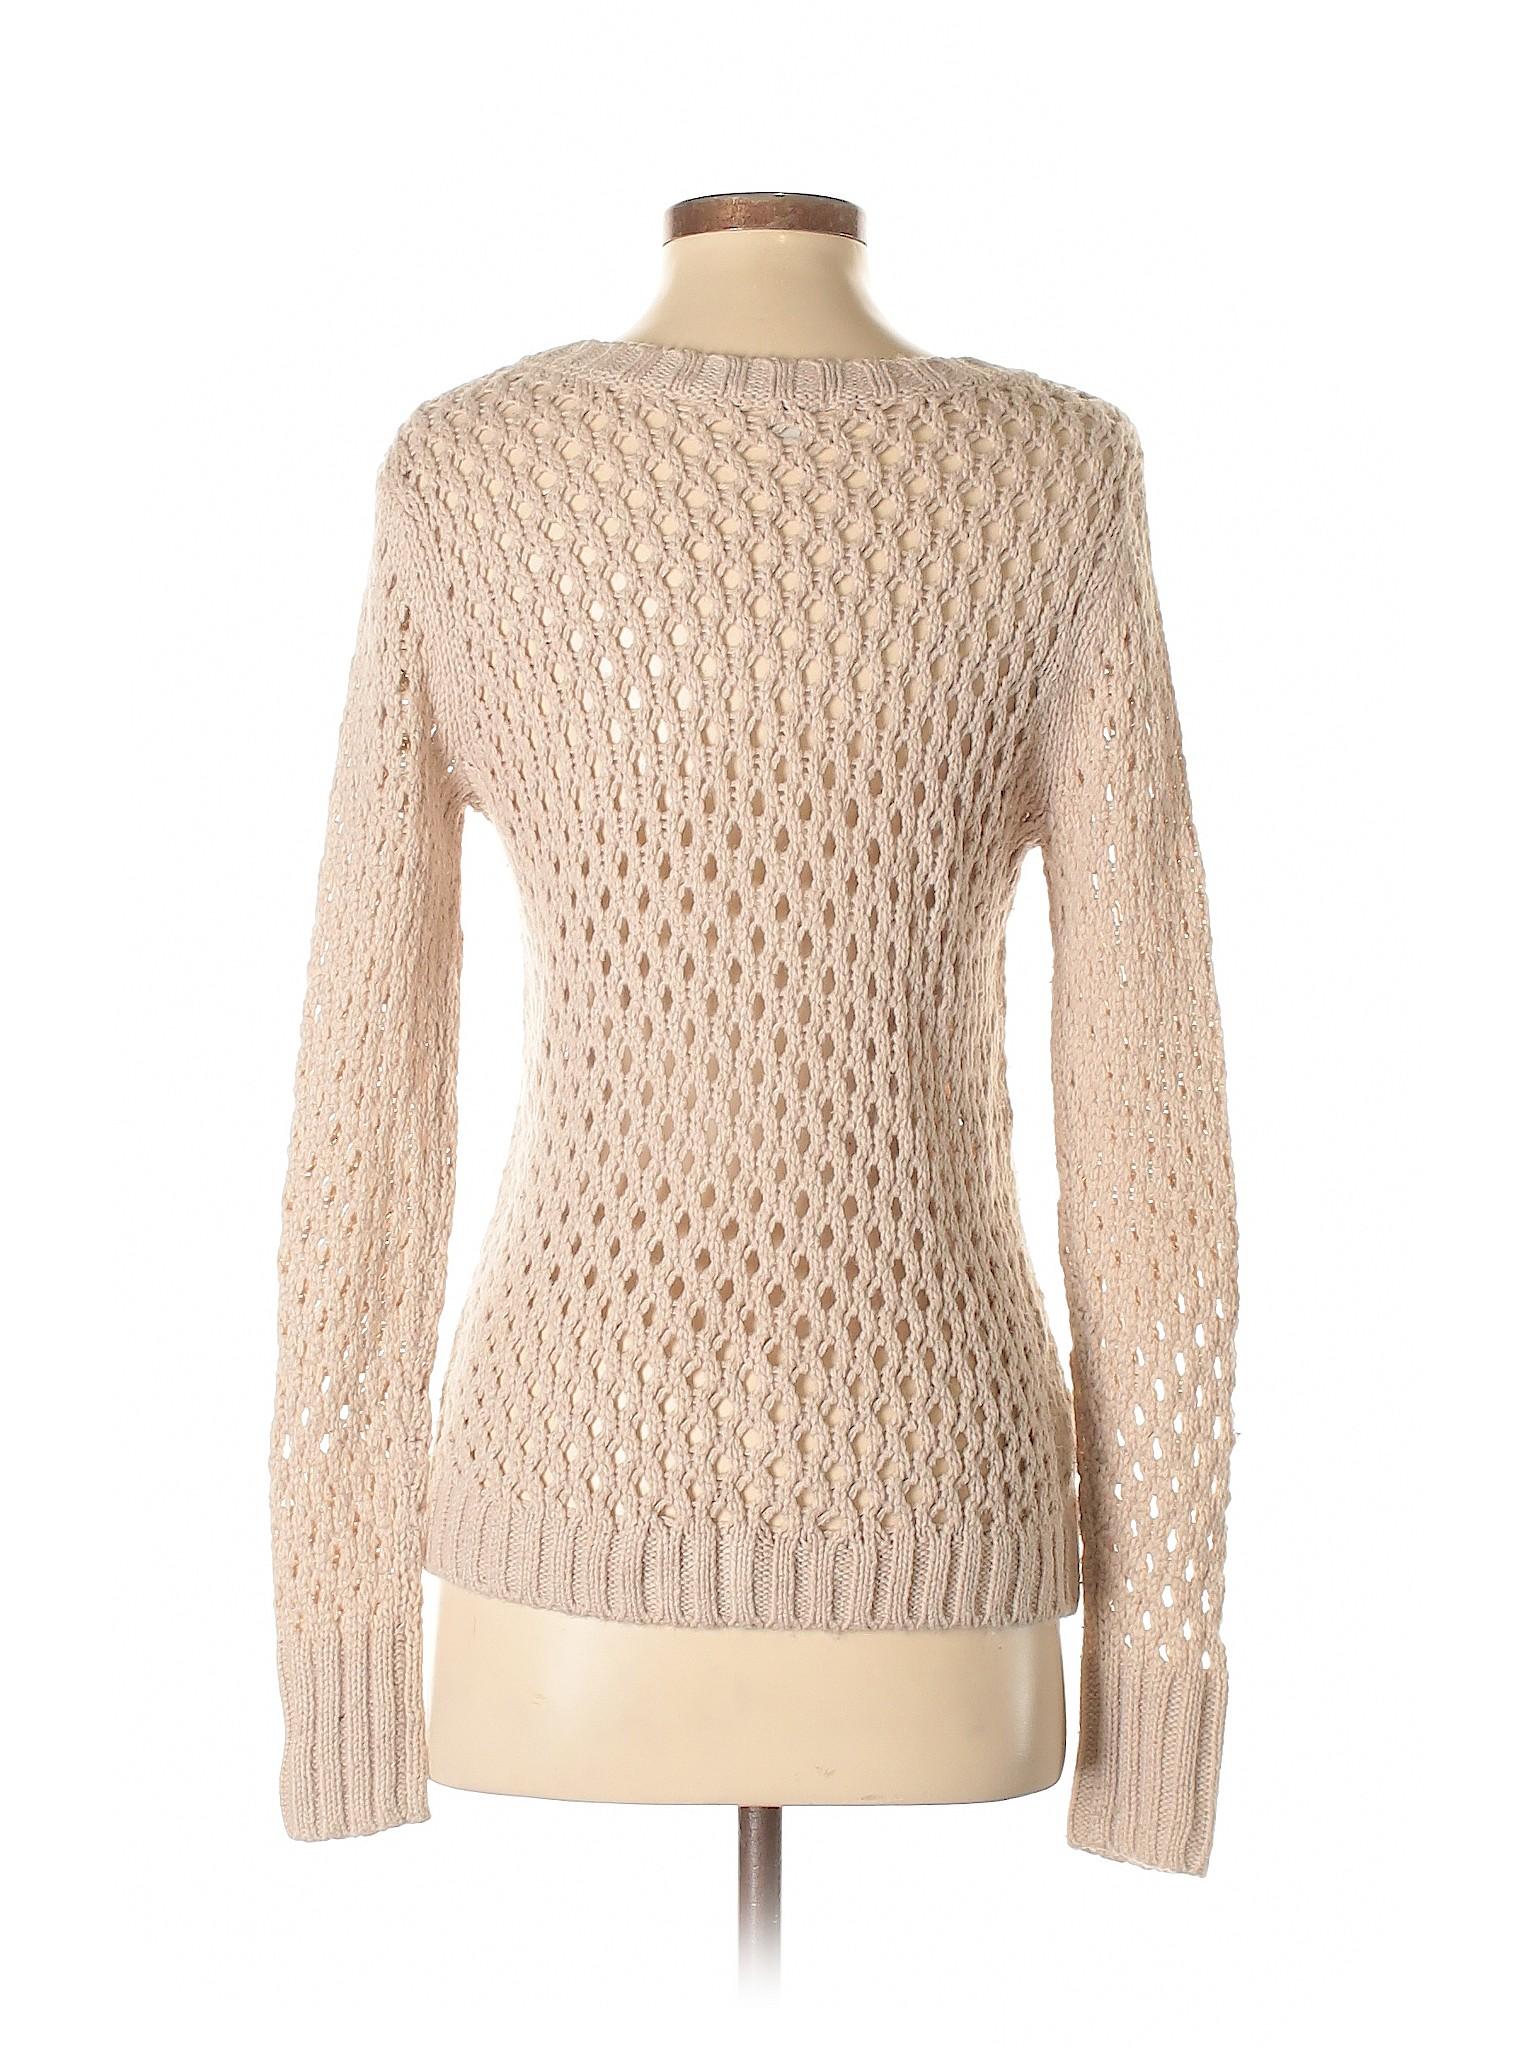 Halogen Boutique Boutique Halogen Sweater Pullover vEBv8WwXq